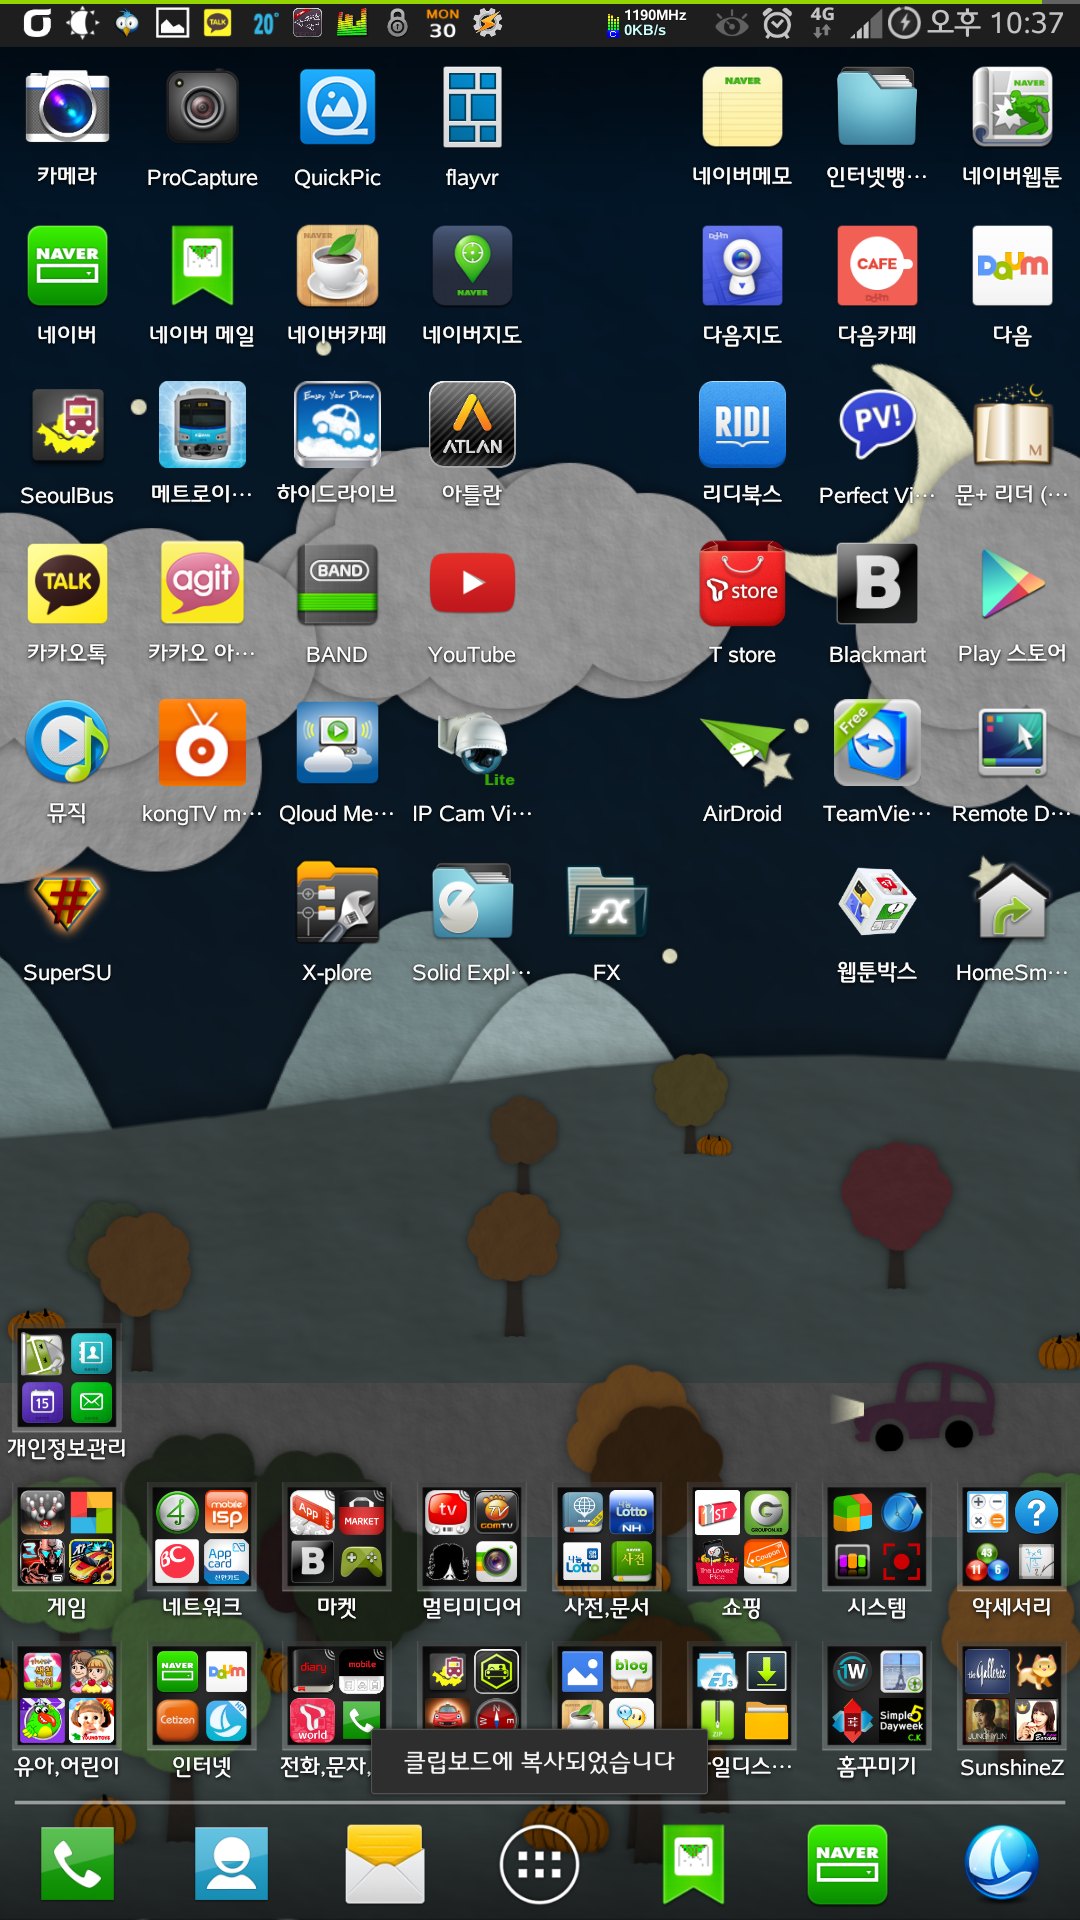 Screenshot_2013-09-30-22-37-12.png